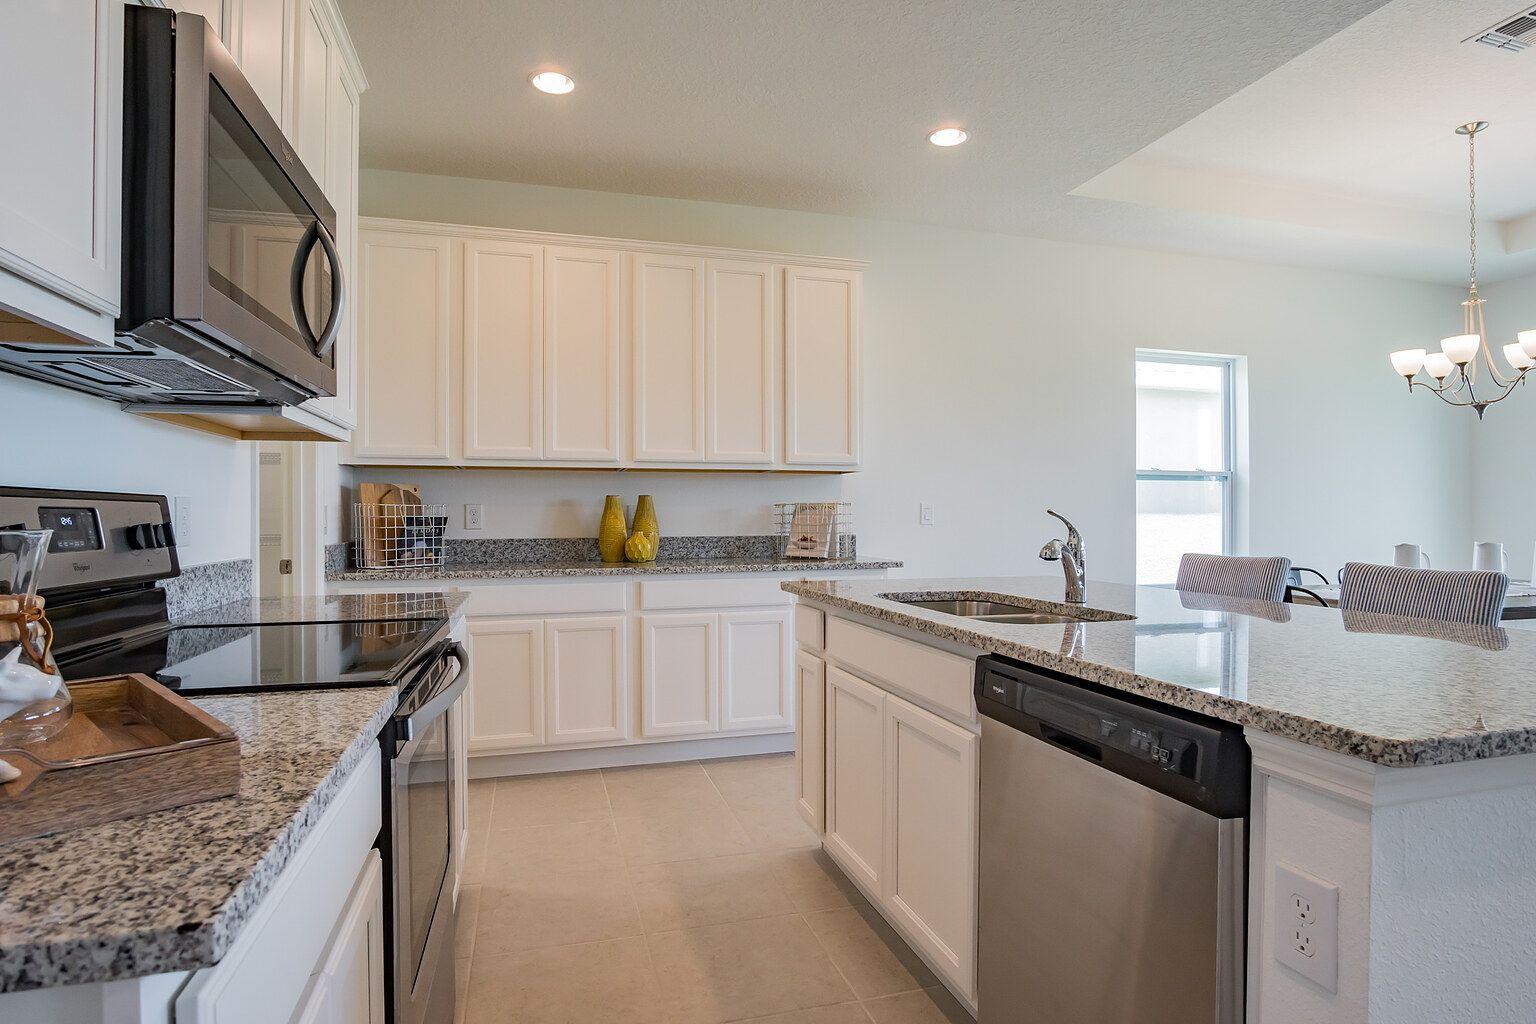 Kitchen featured in the Reef By Ashton Woods in Daytona Beach, FL